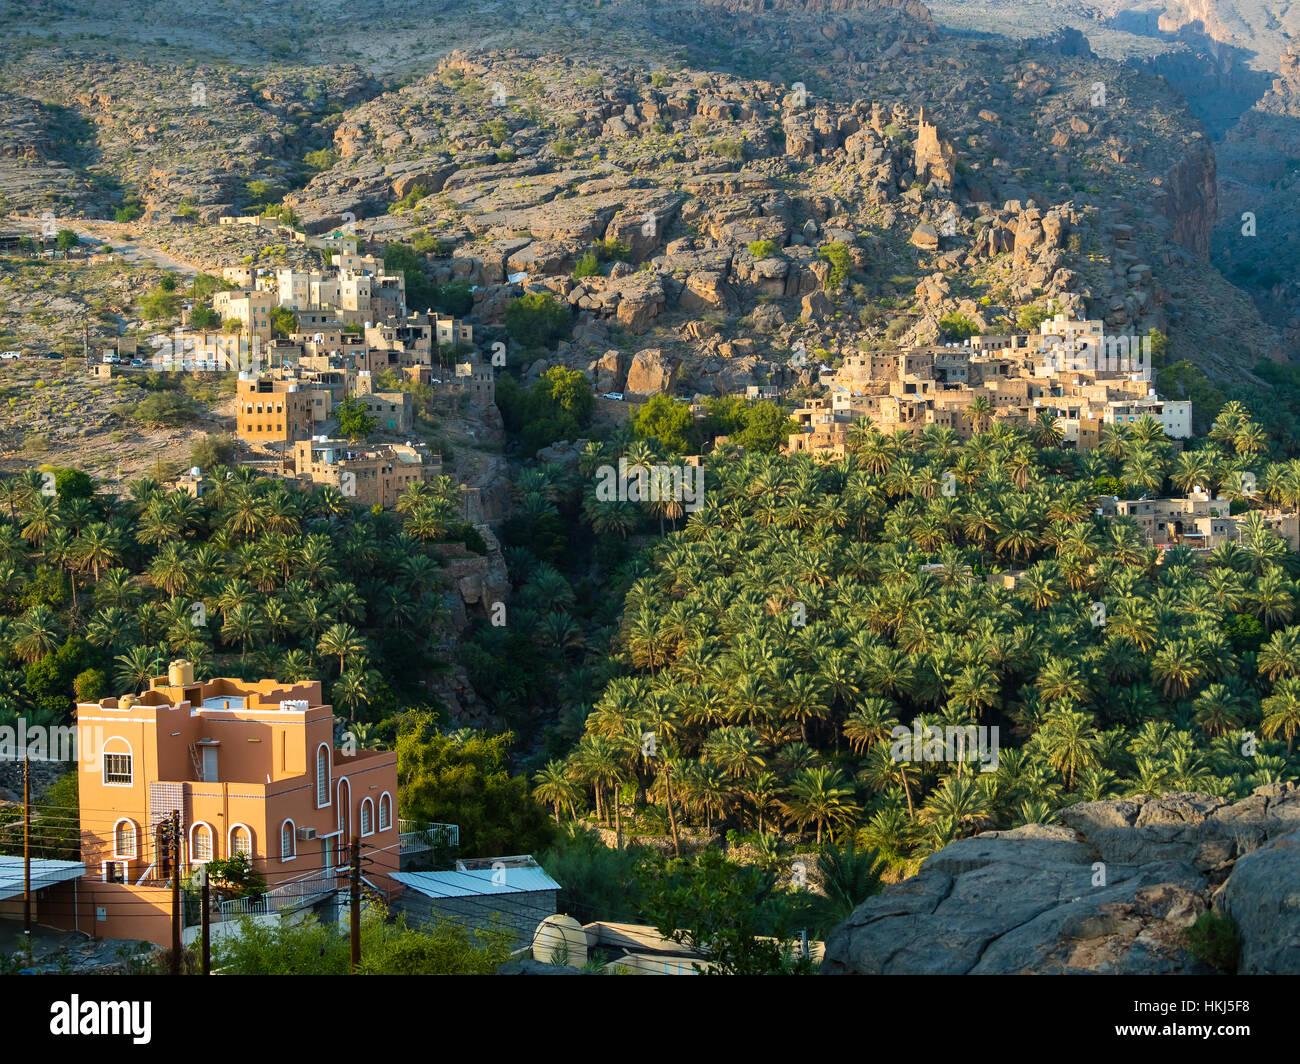 Oasis Al-Hamra with mountain village Misfah Wadi, Jebel Shams, Al Hajar Mountains, Dhakiliya Region, Oman - Stock Image